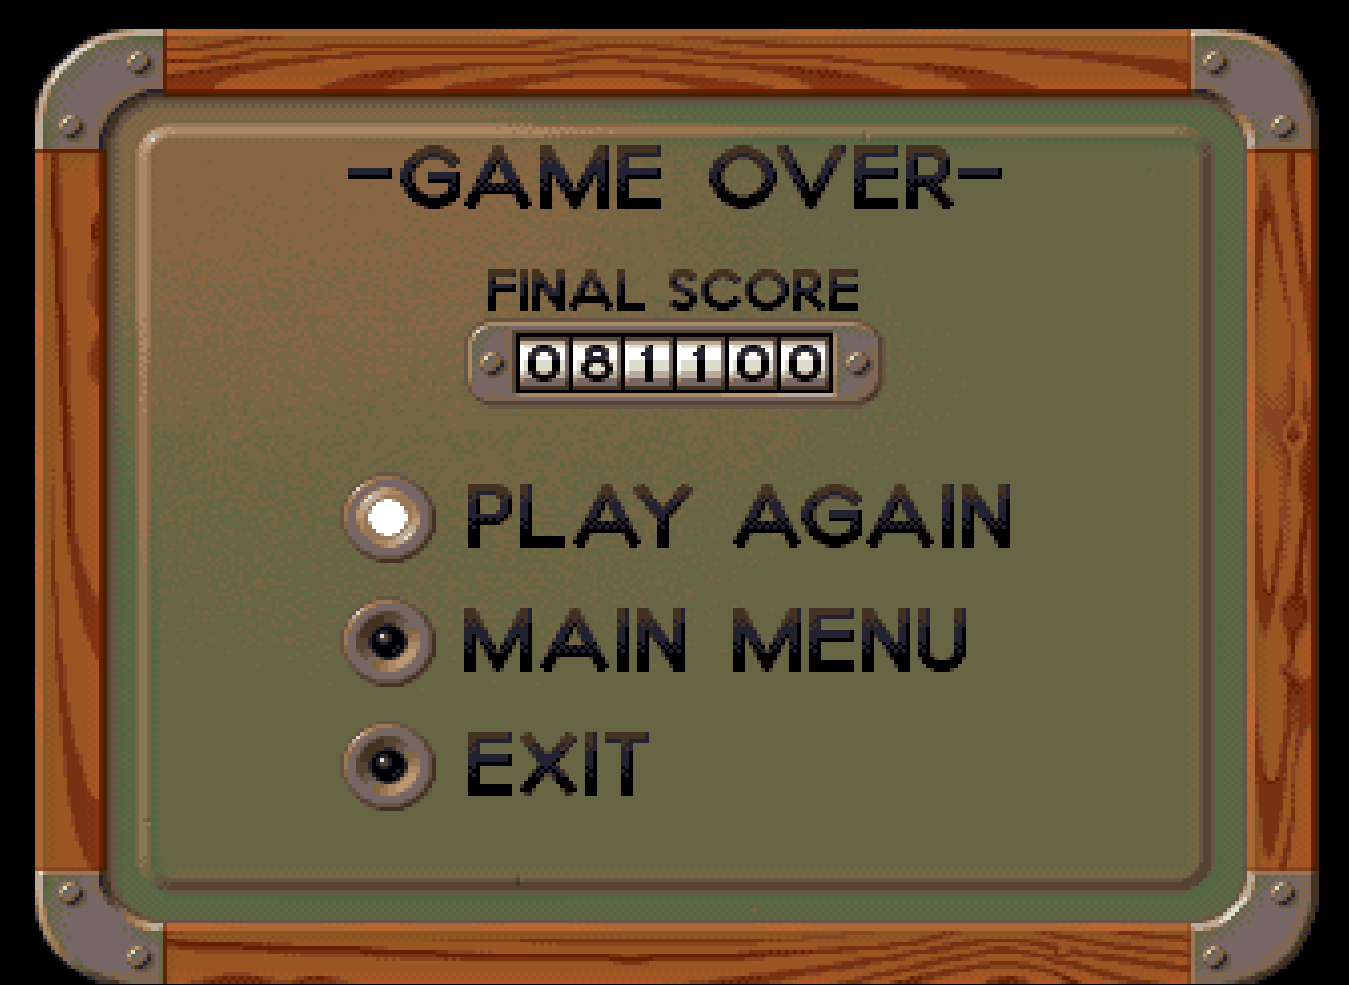 Mantalow: Kid Chaos (Amiga Emulated) 81,100 points on 2016-07-21 13:36:14